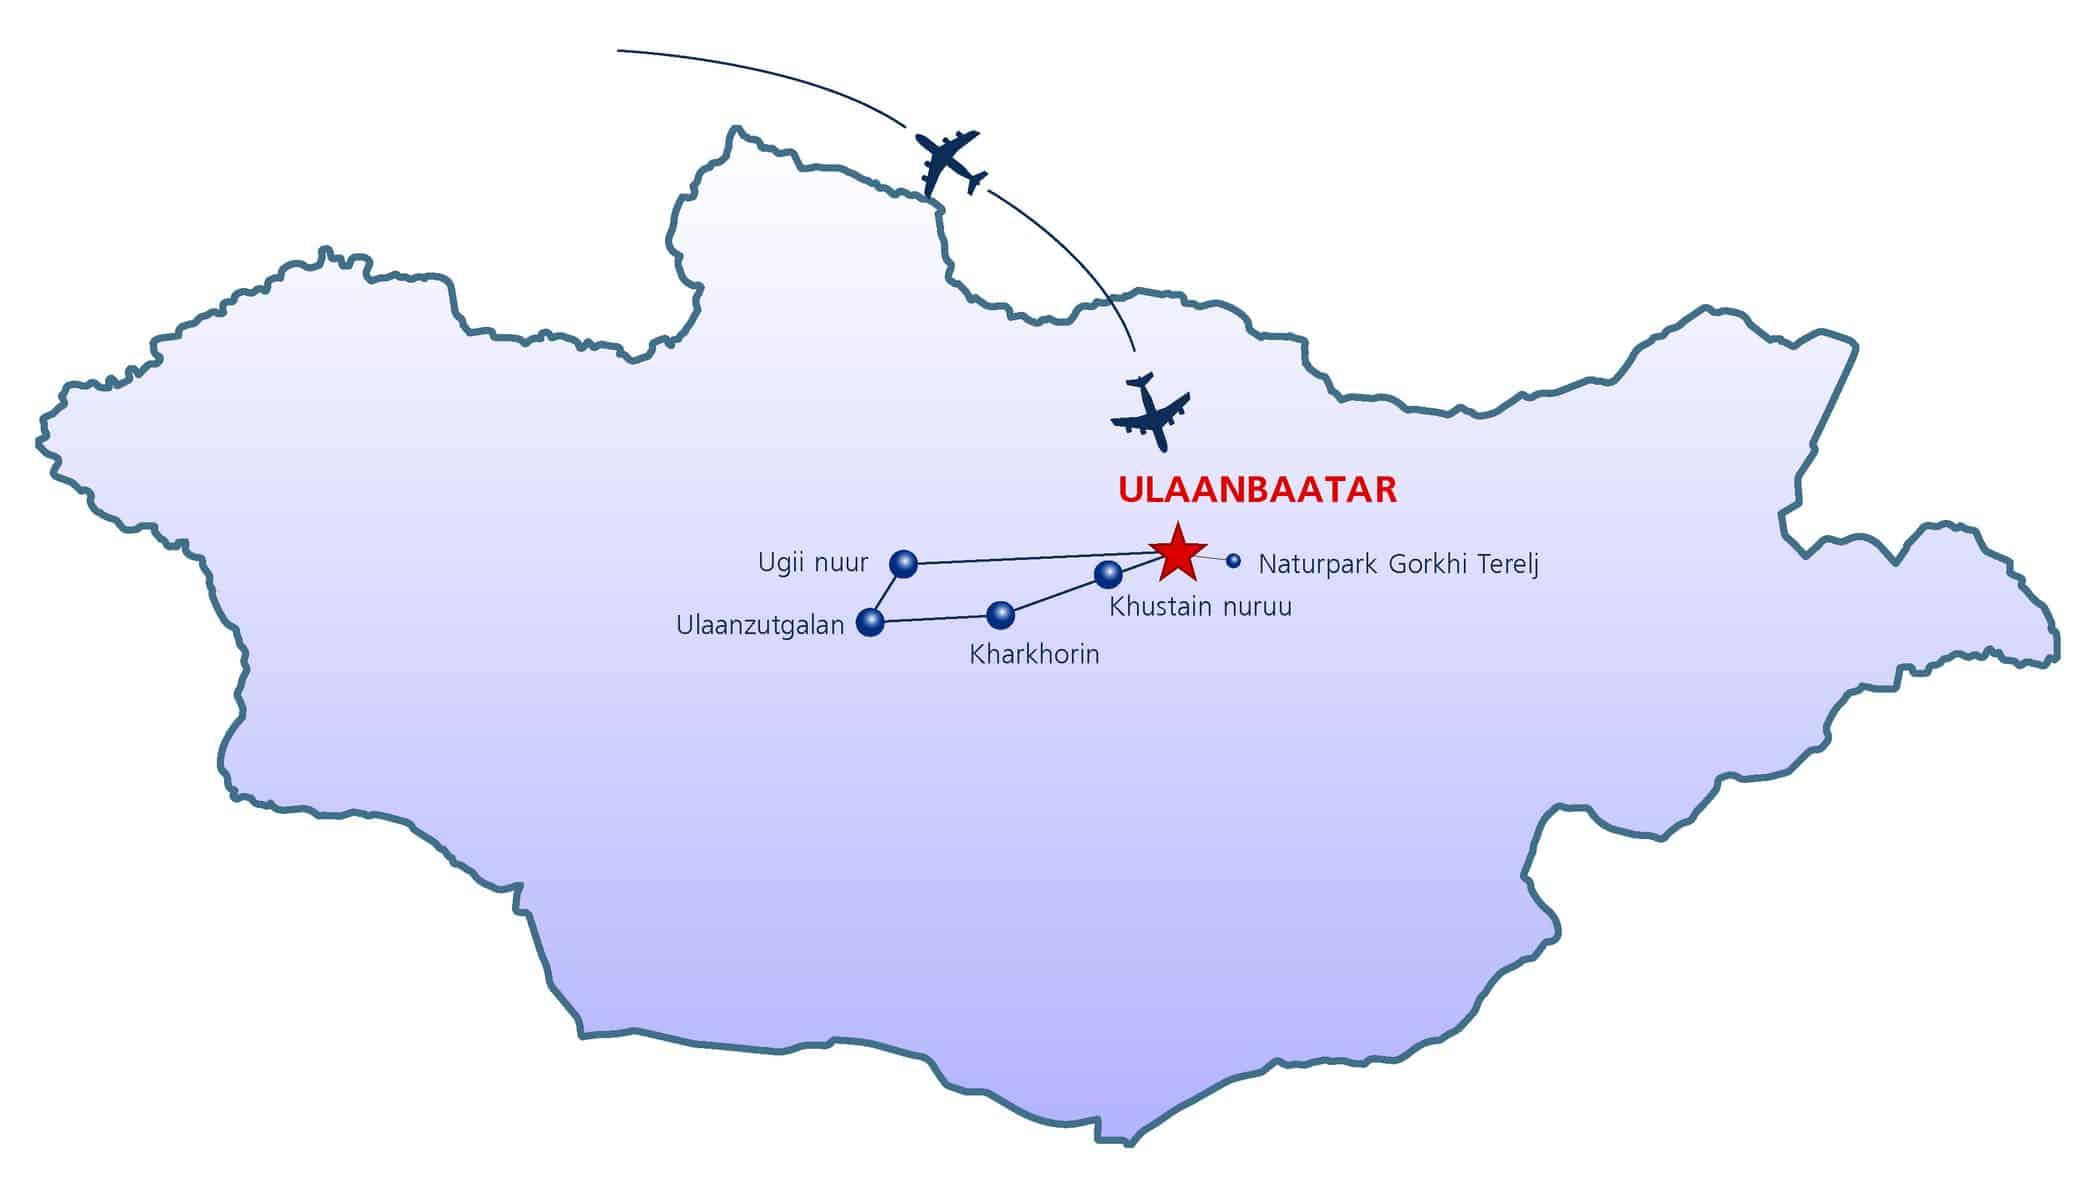 Okovolunteer Programm Im Naturpark Khustai Nuruu Und Orkhon 18 Tage Reisen In Die Mongolei Mit Explore Mongolia